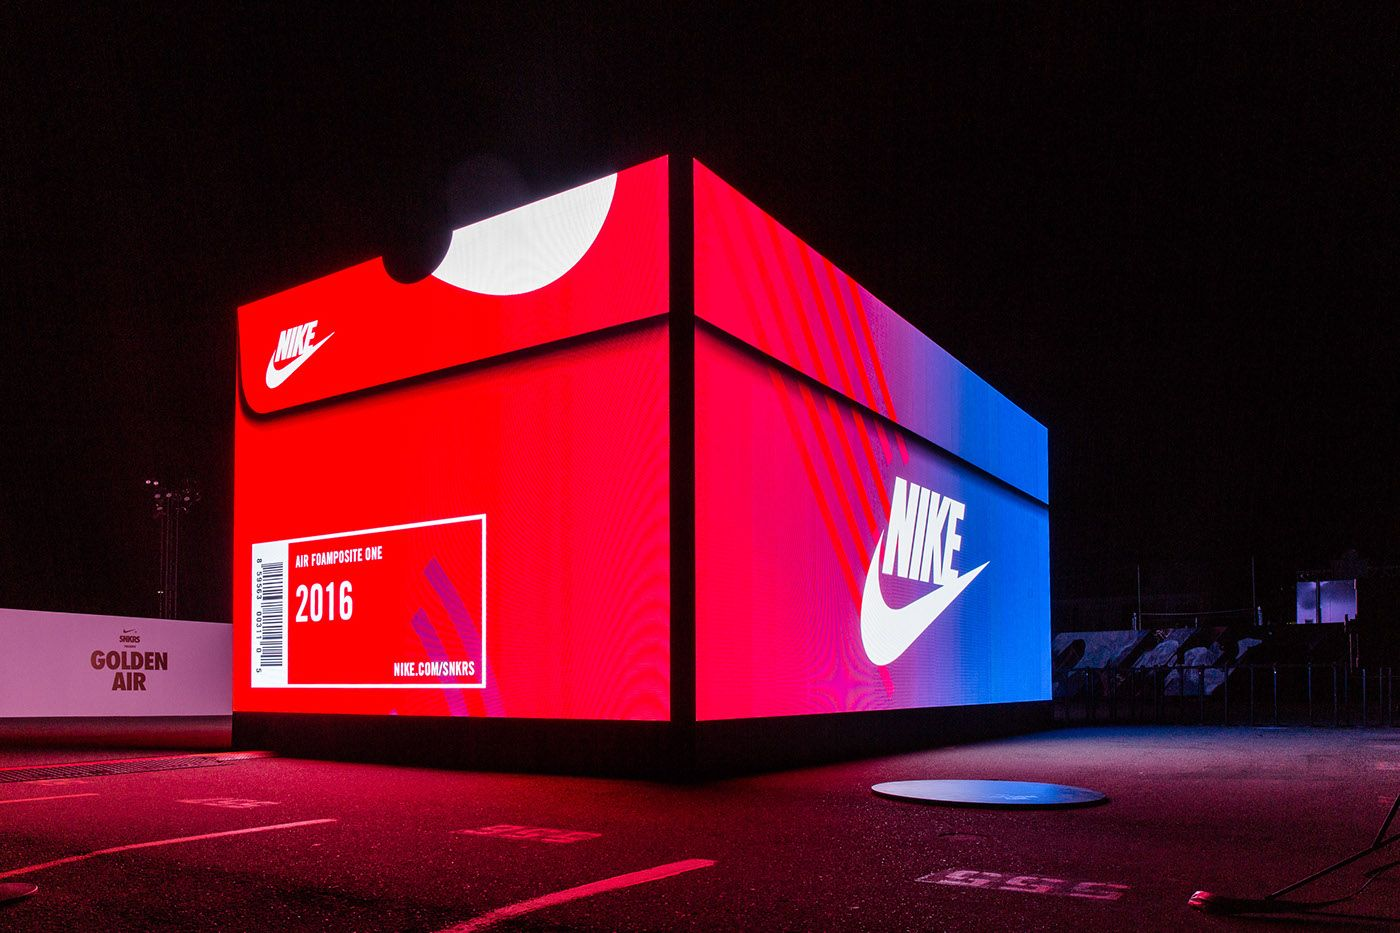 Nike Snkrs Box San Francisco On Behance Pop Up Store Nike Snkrs Pop Up